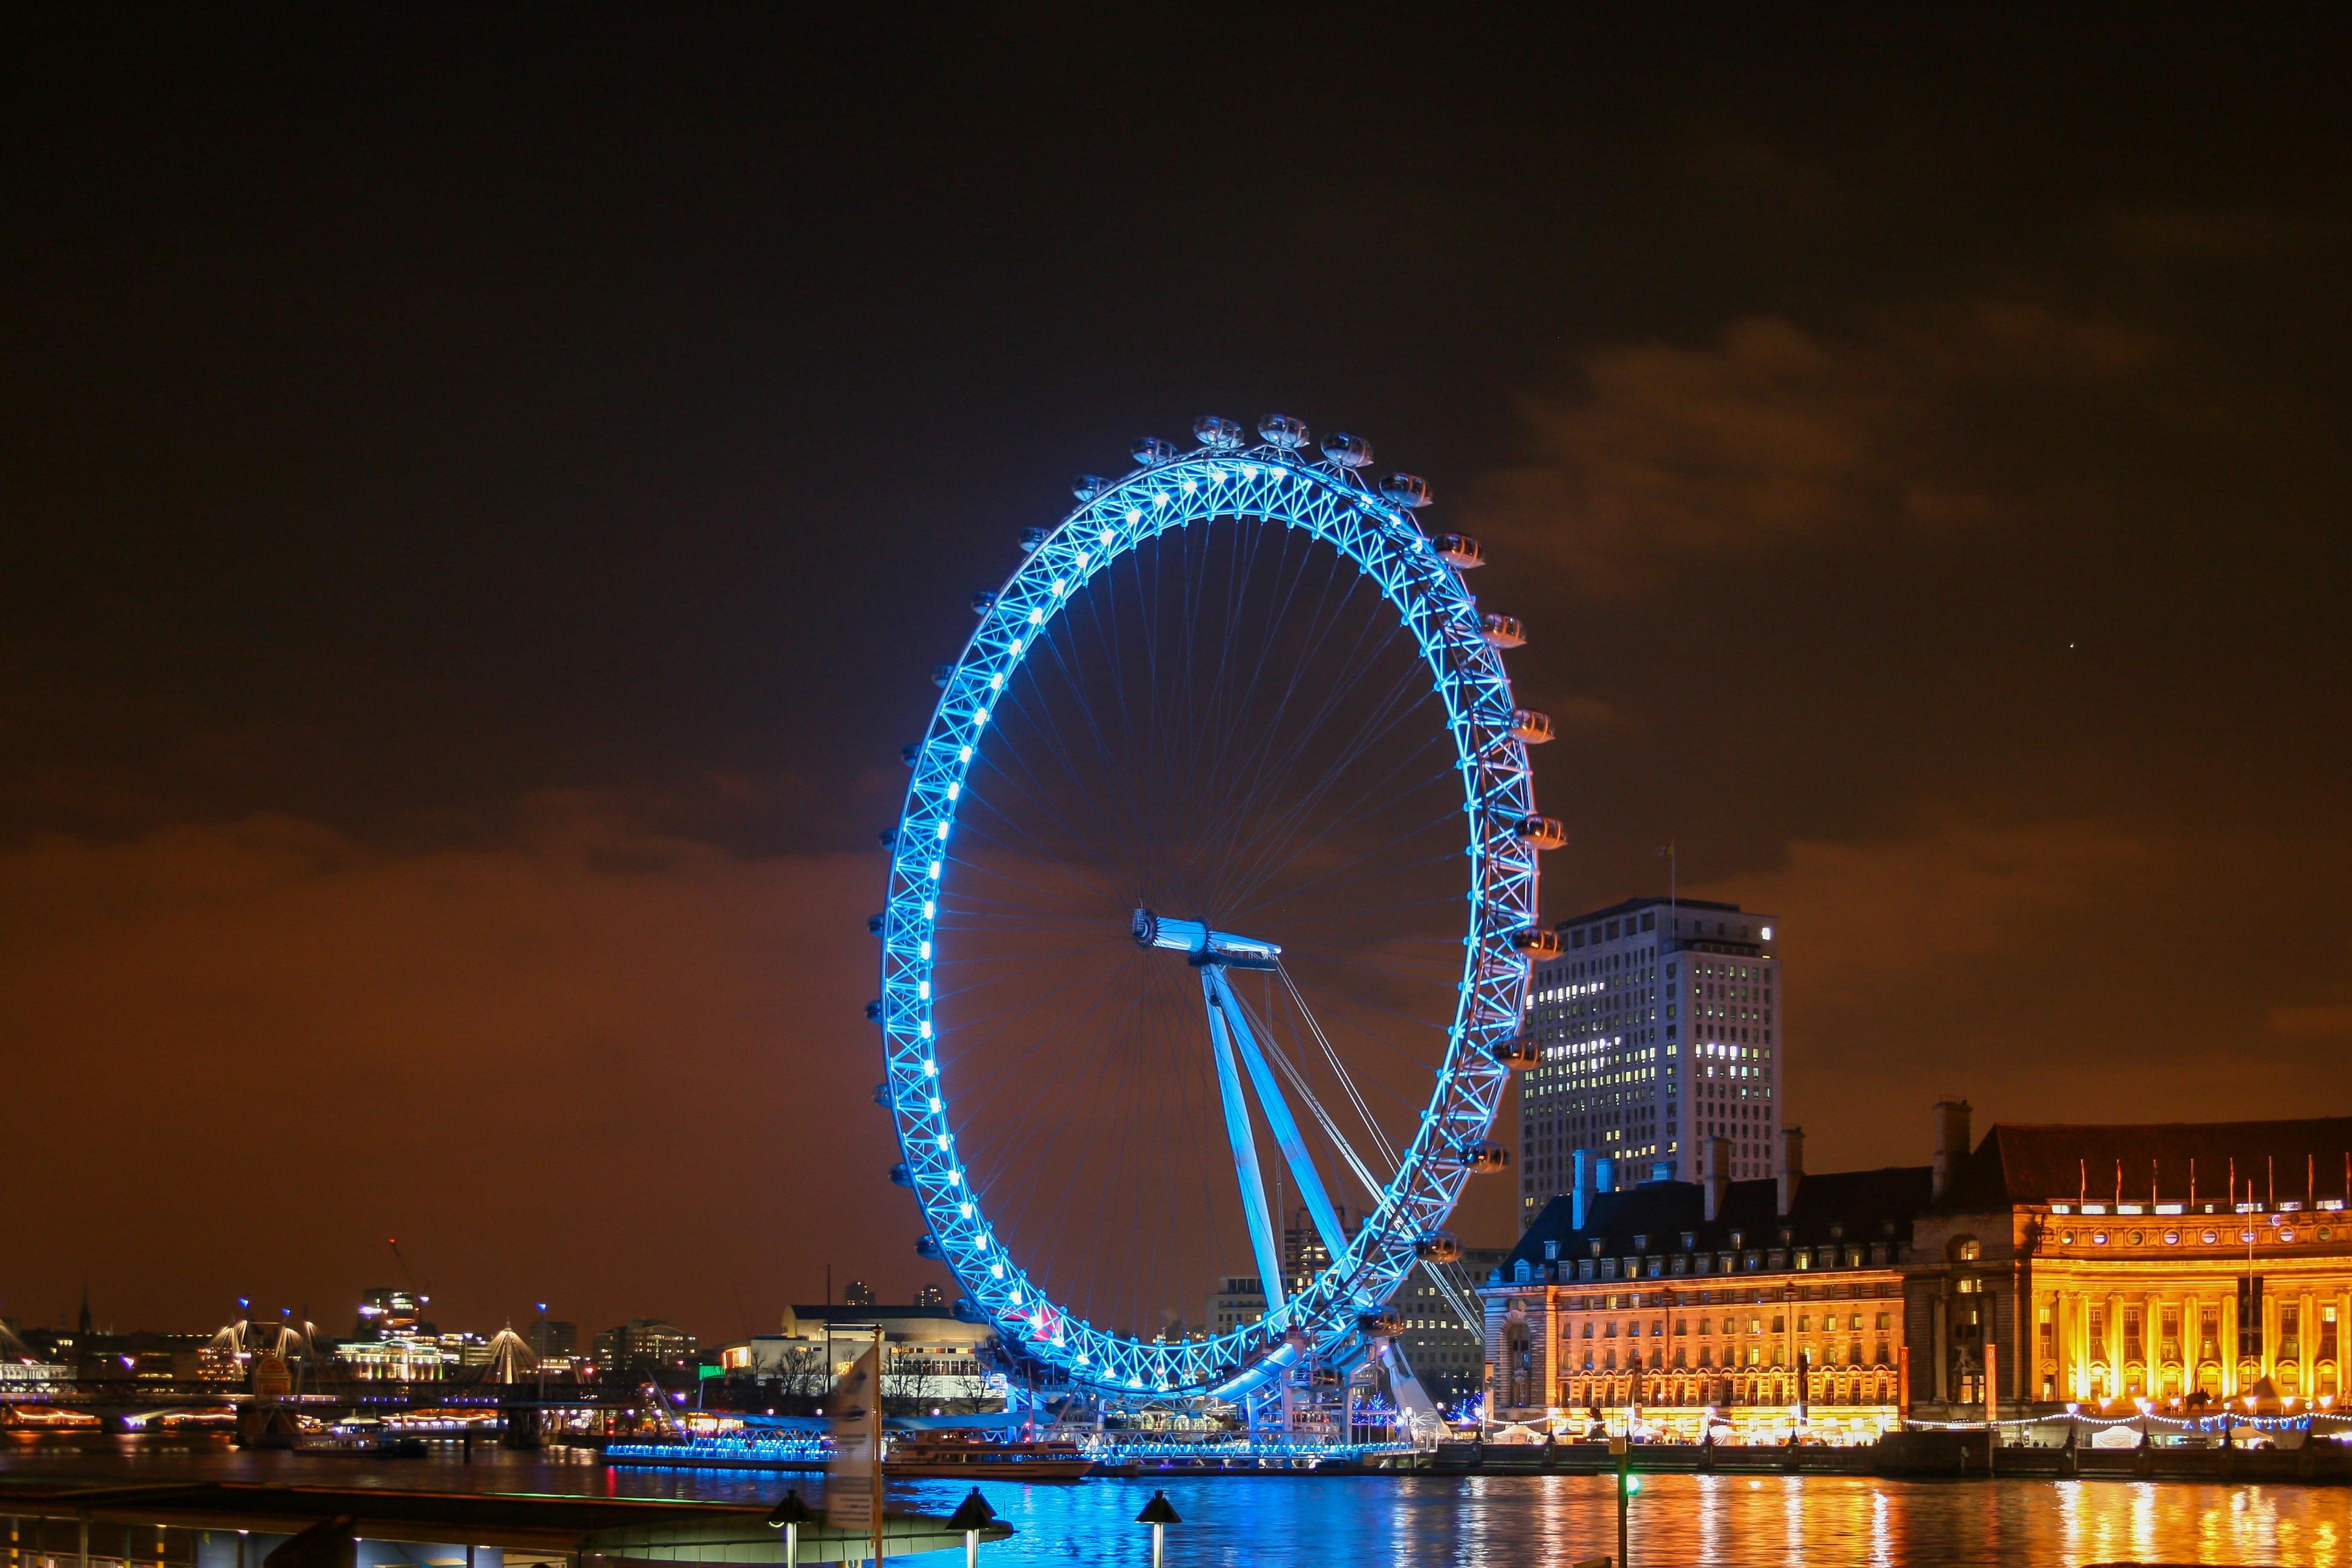 london eye by night - photo #2